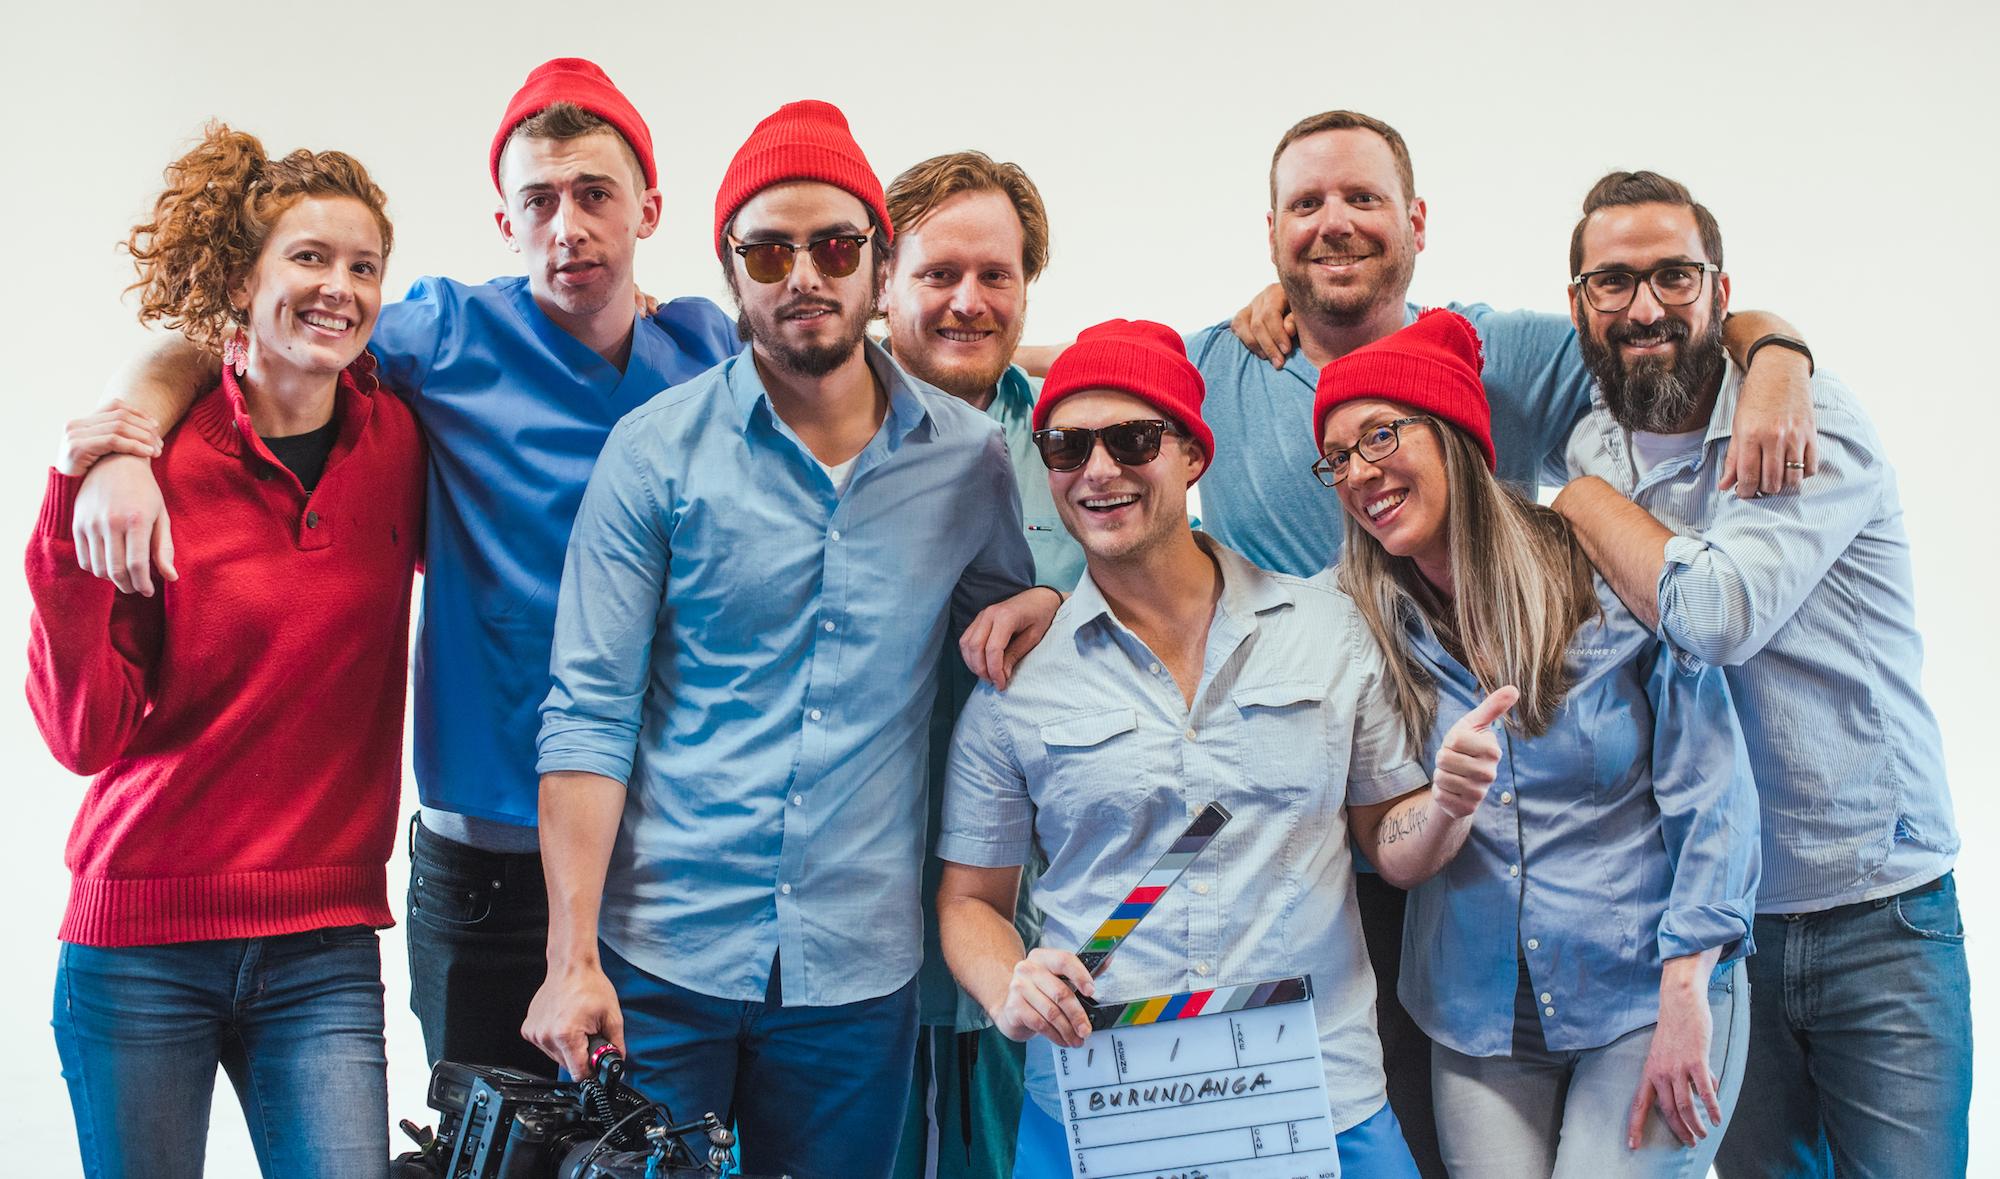 Esteban Was Eaten Crew and Cast Photoshoot (Minus Tom + Nick)